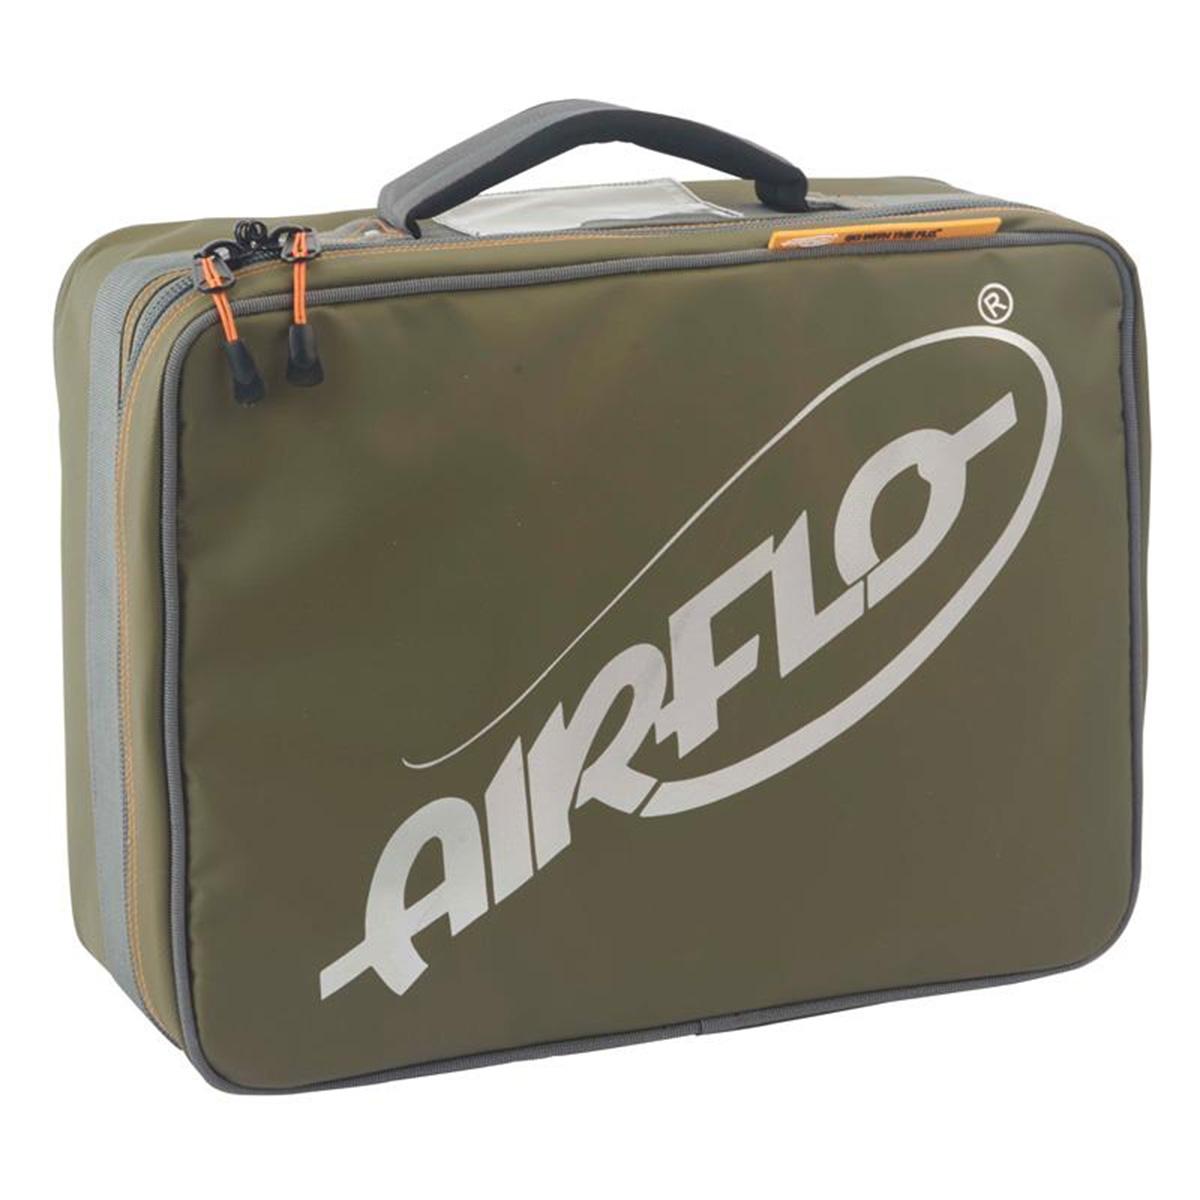 Airflo Fly Dri Reel Gear Case Fishing Bags Luggage